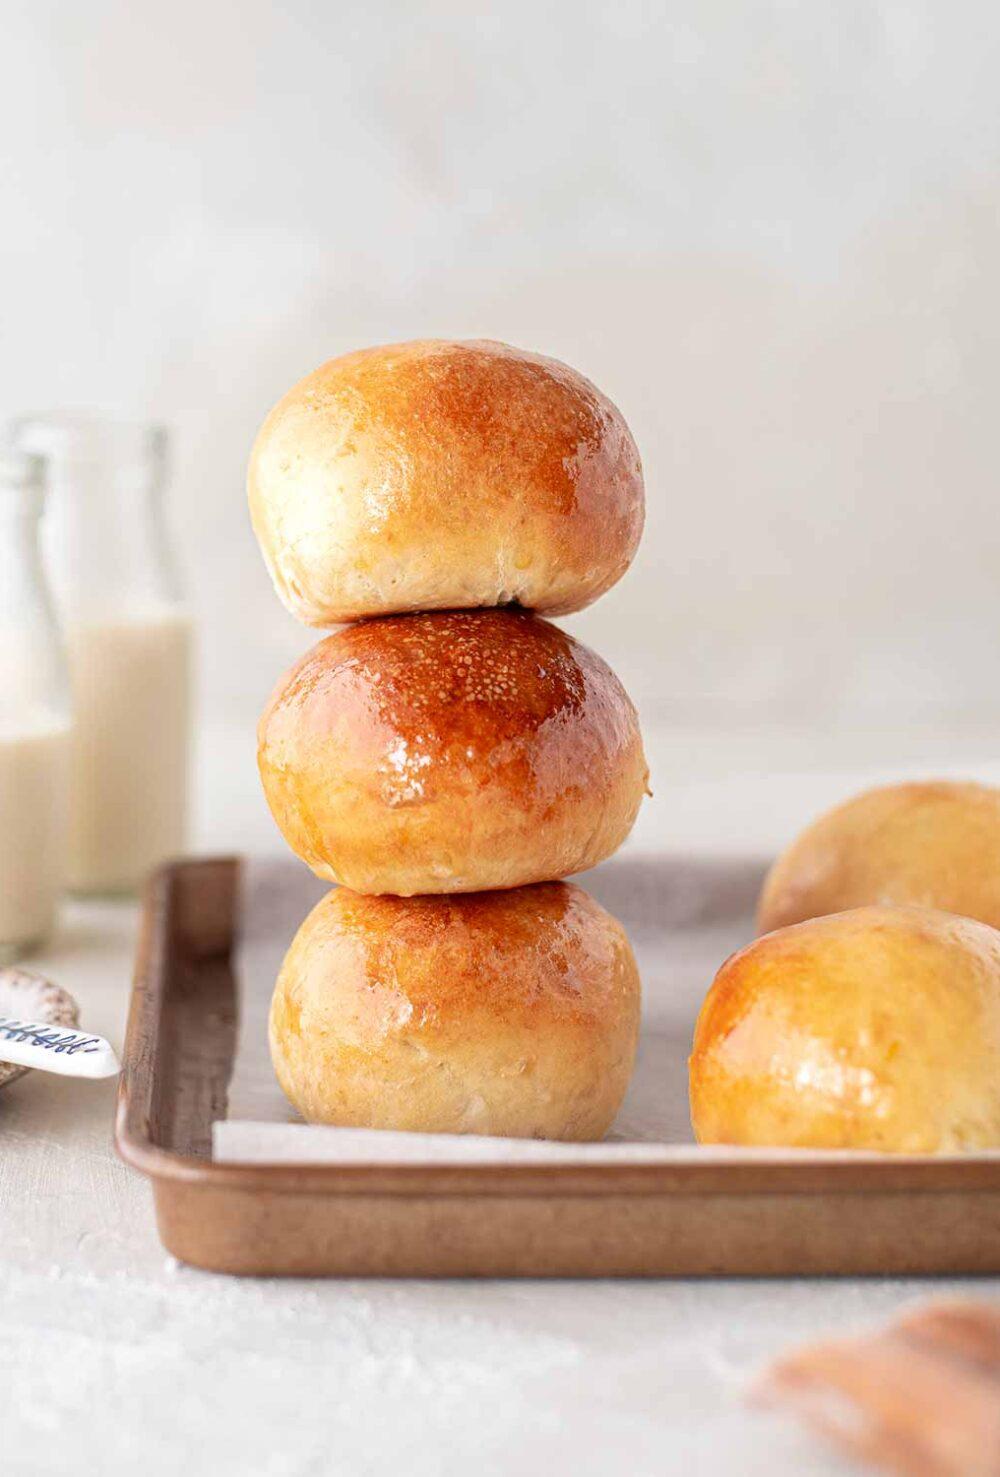 Stack of three vegan brioche buns